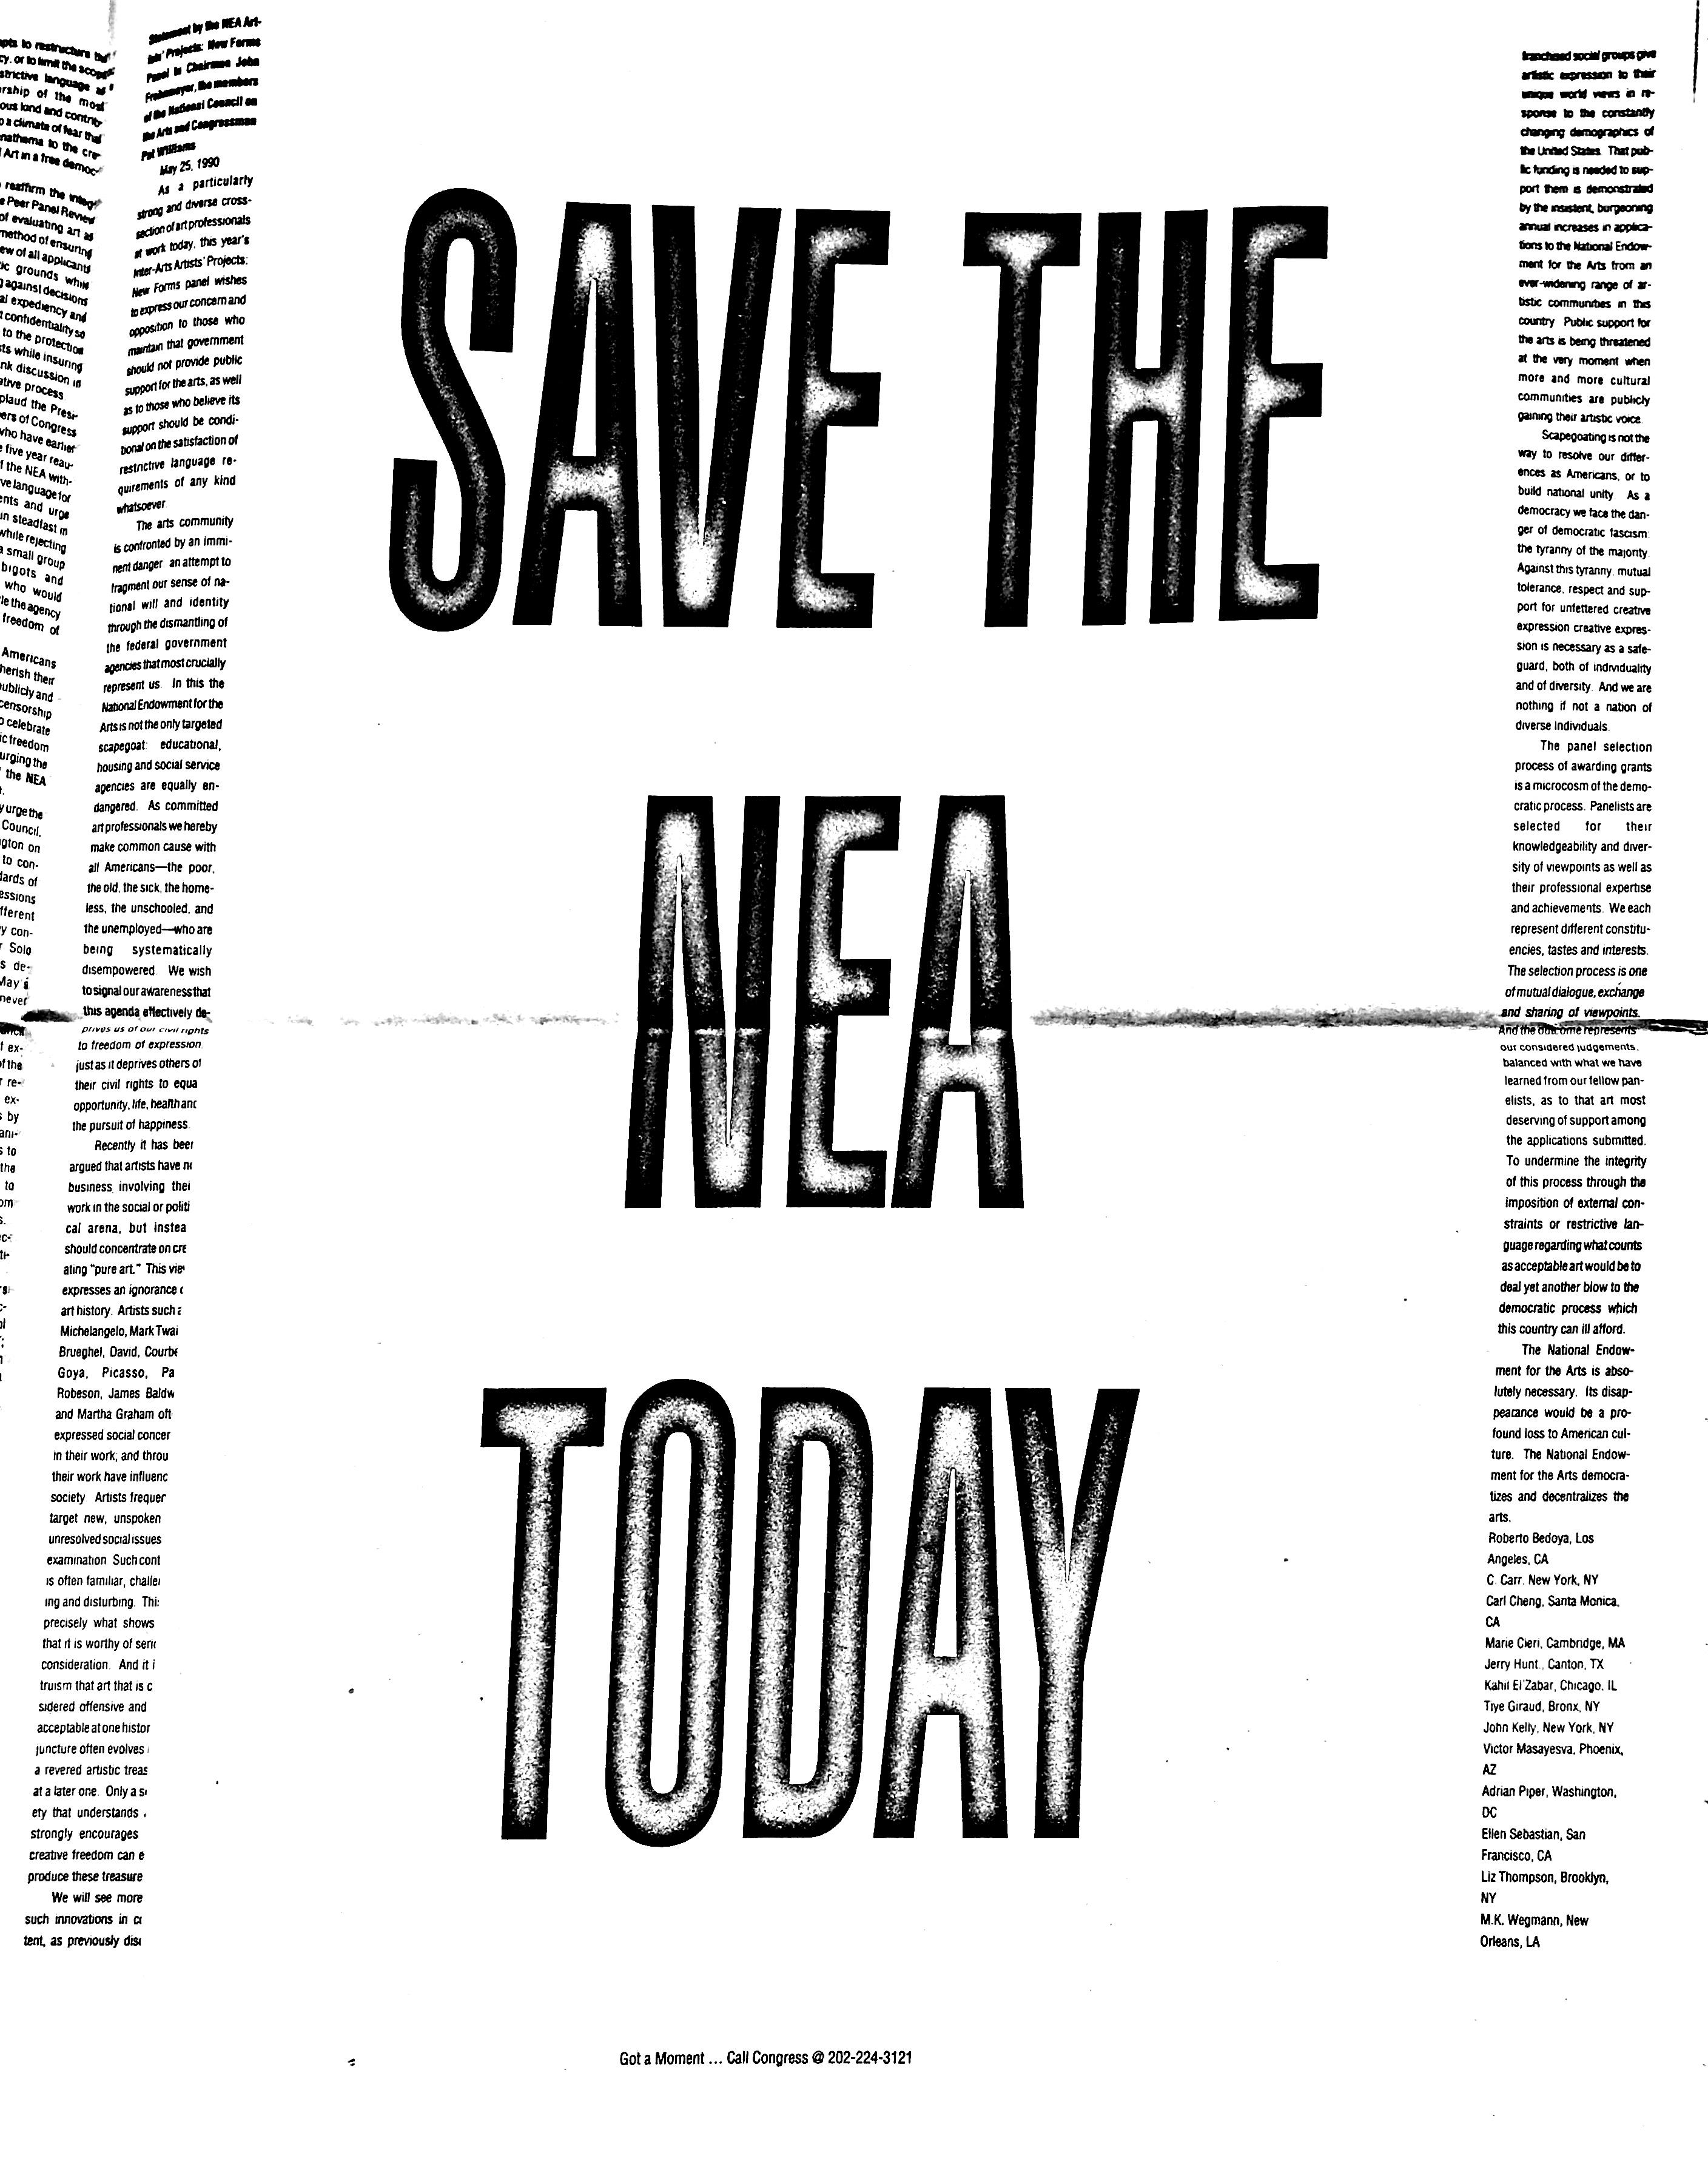 June 1990 - NAAO Bulletin Page 5.jpg